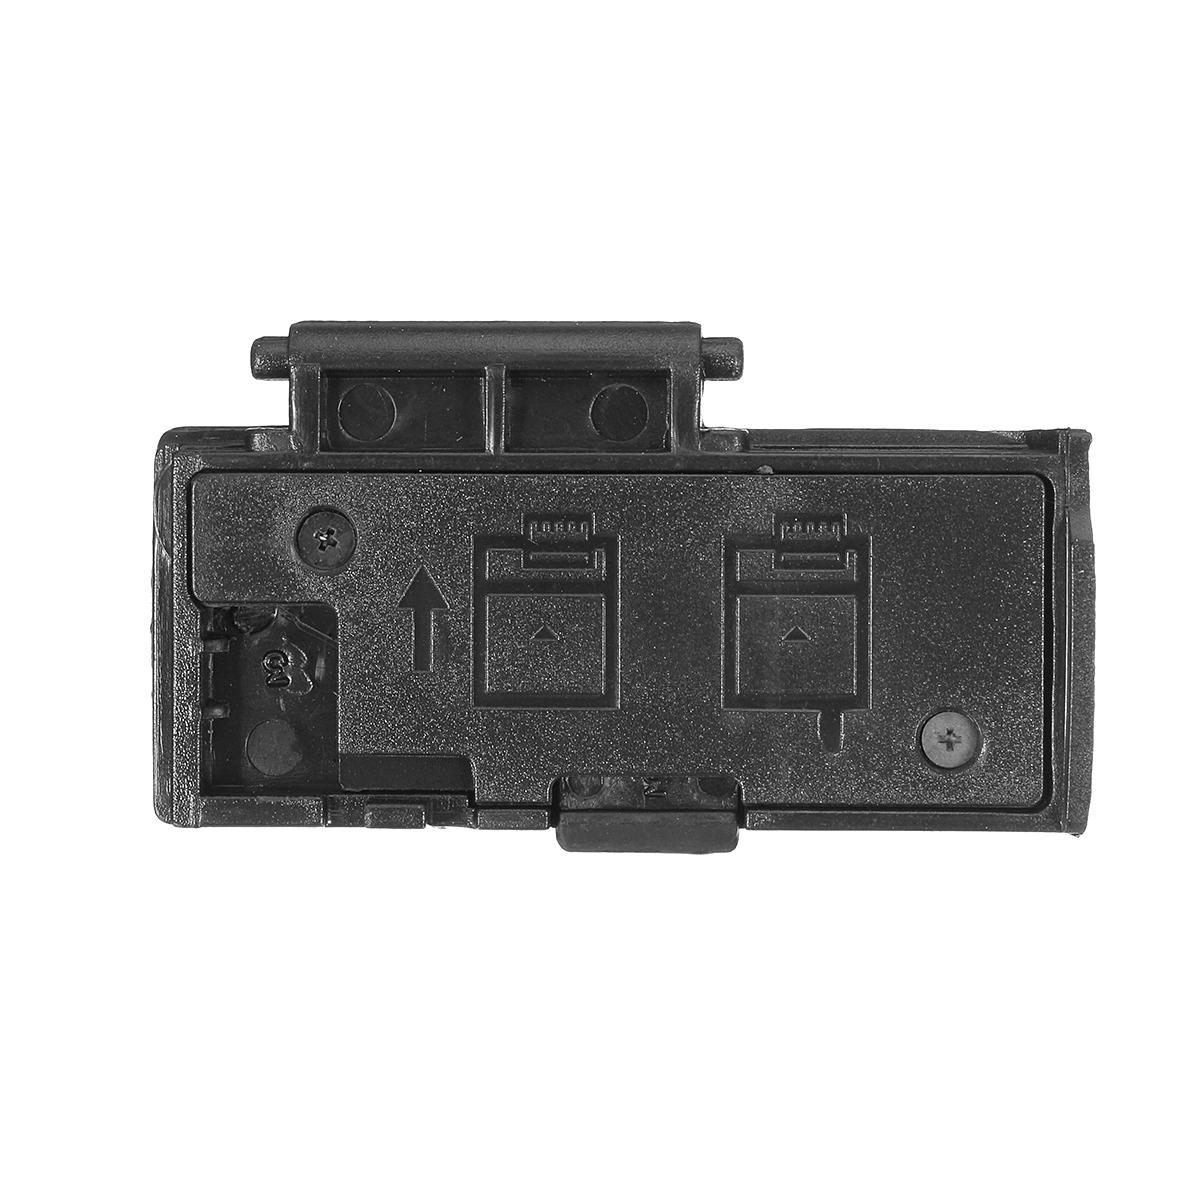 Battery Door Cover Lid Cap Repair Replacement Part Plastic For Canon EOS 550D